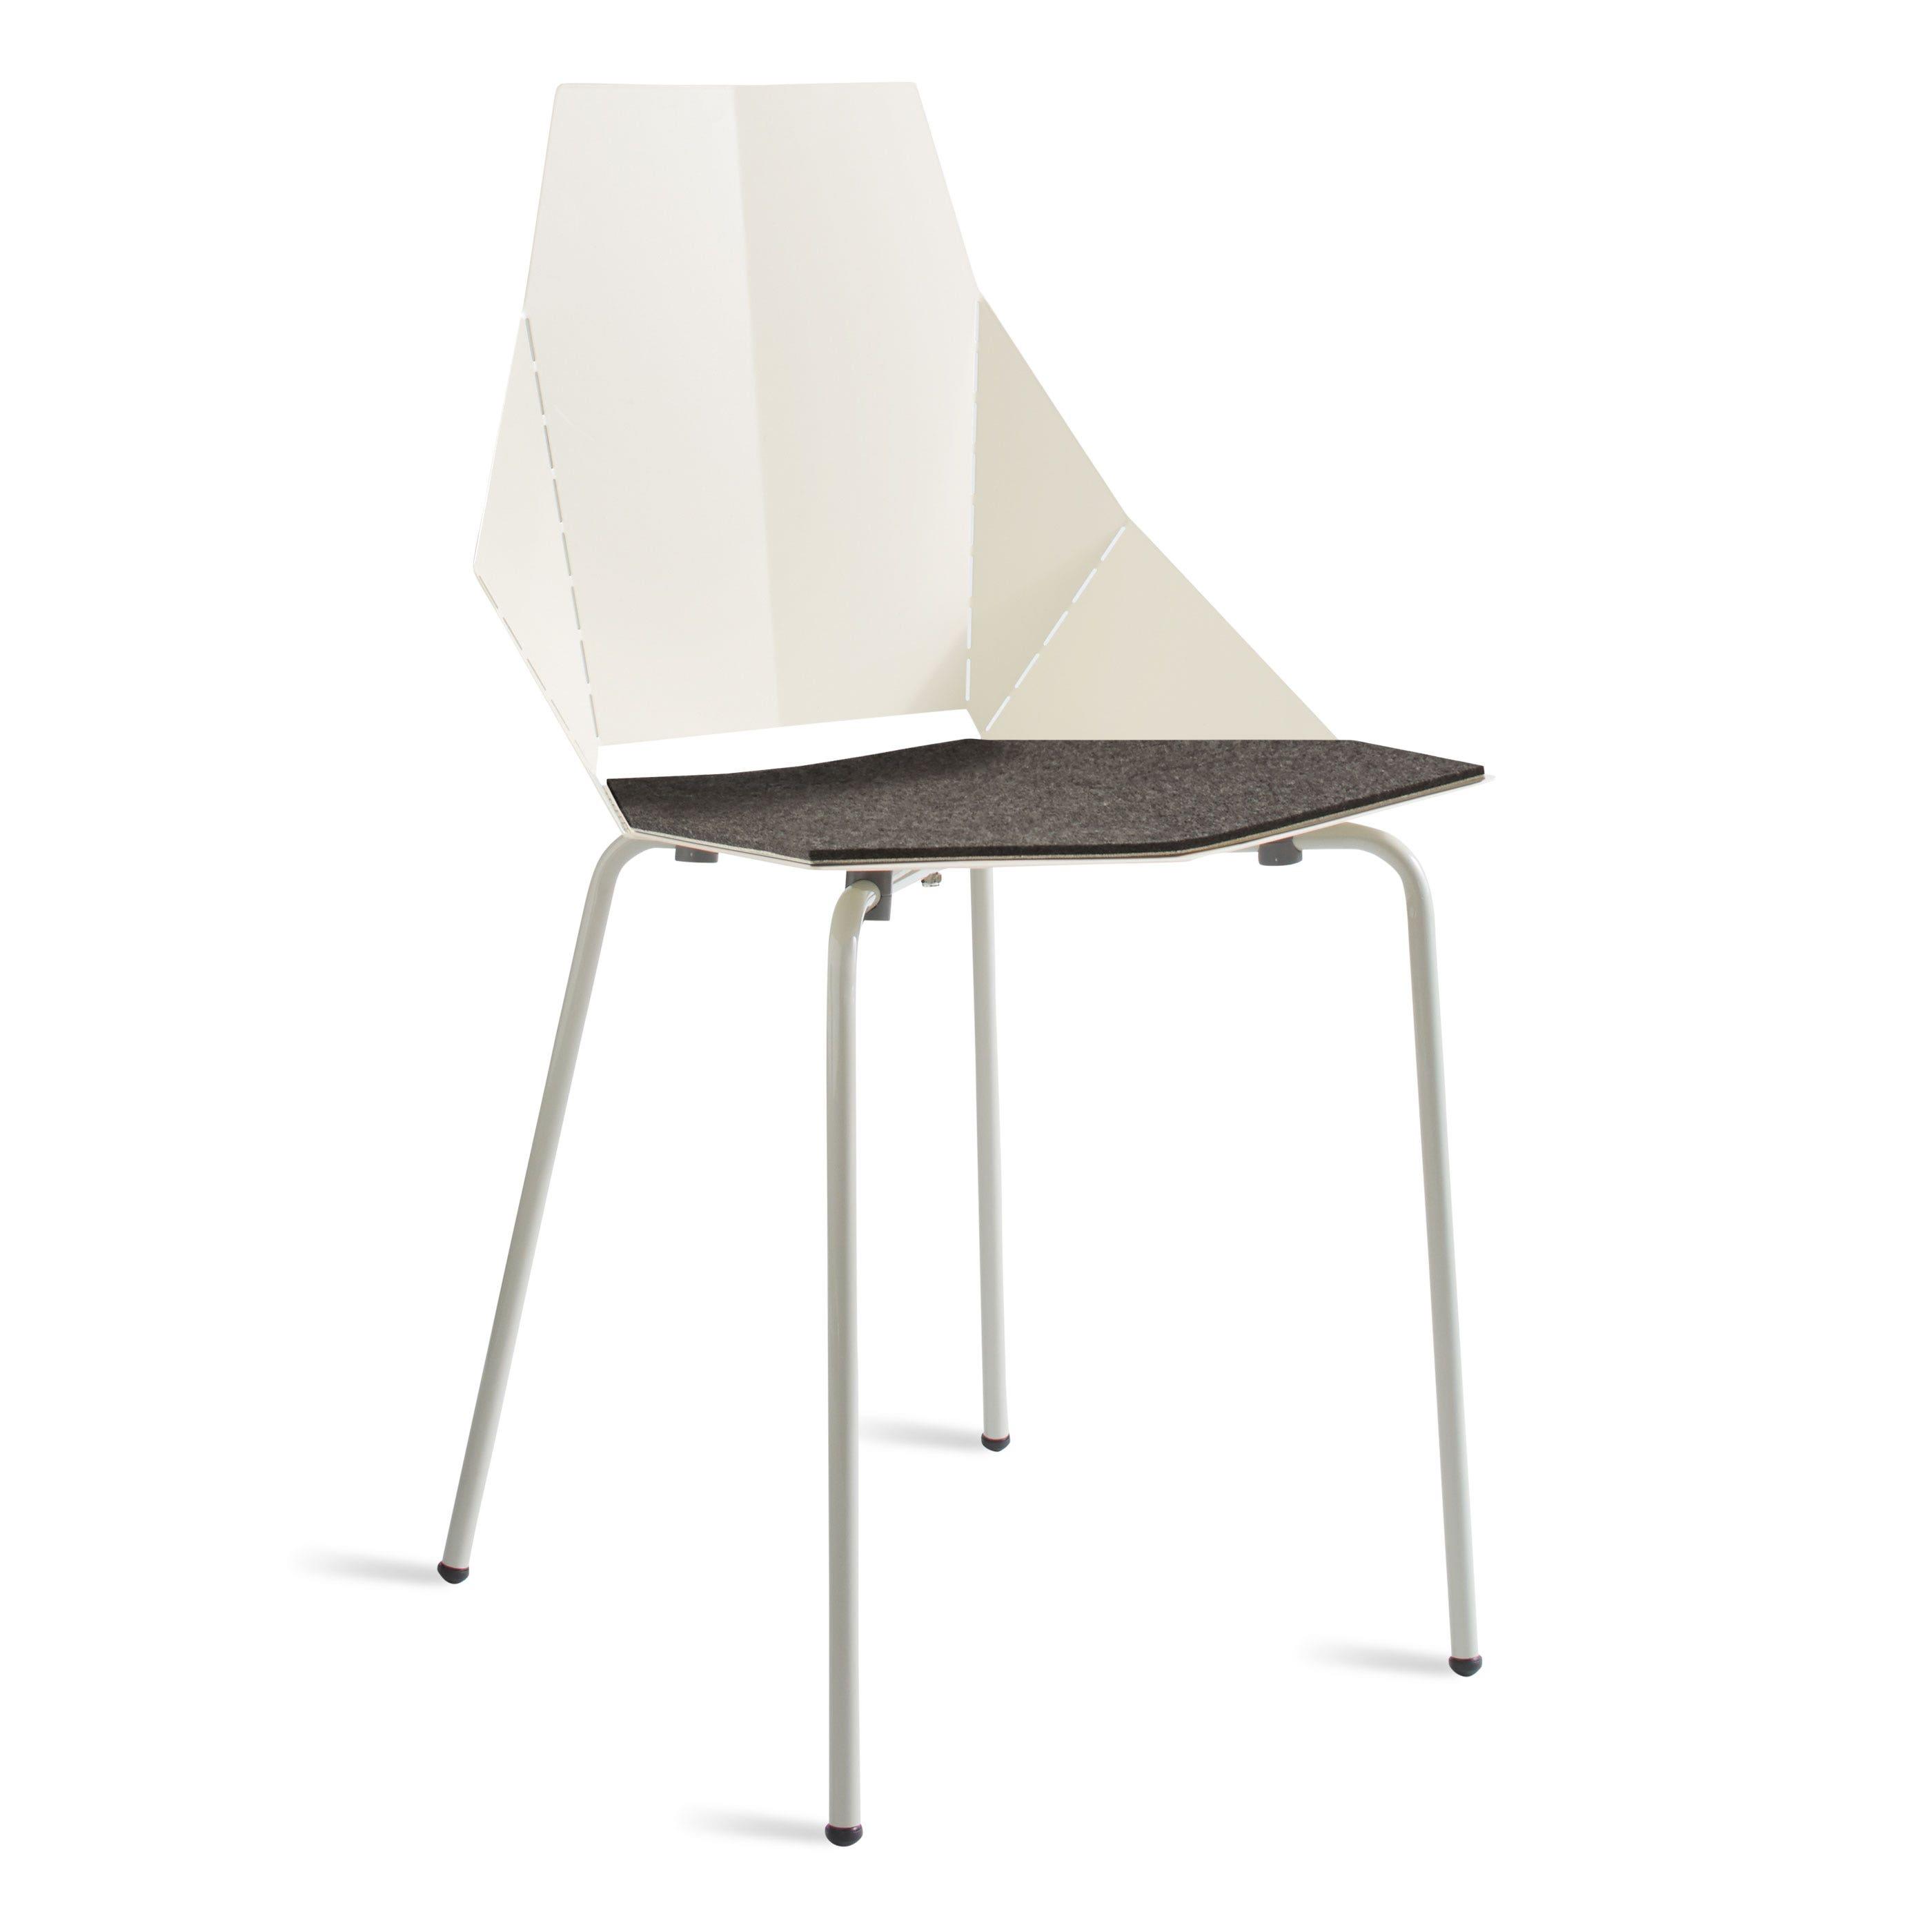 Real Good Felt Chair Pad Modern Chairs & Chair Pads Blu Dot